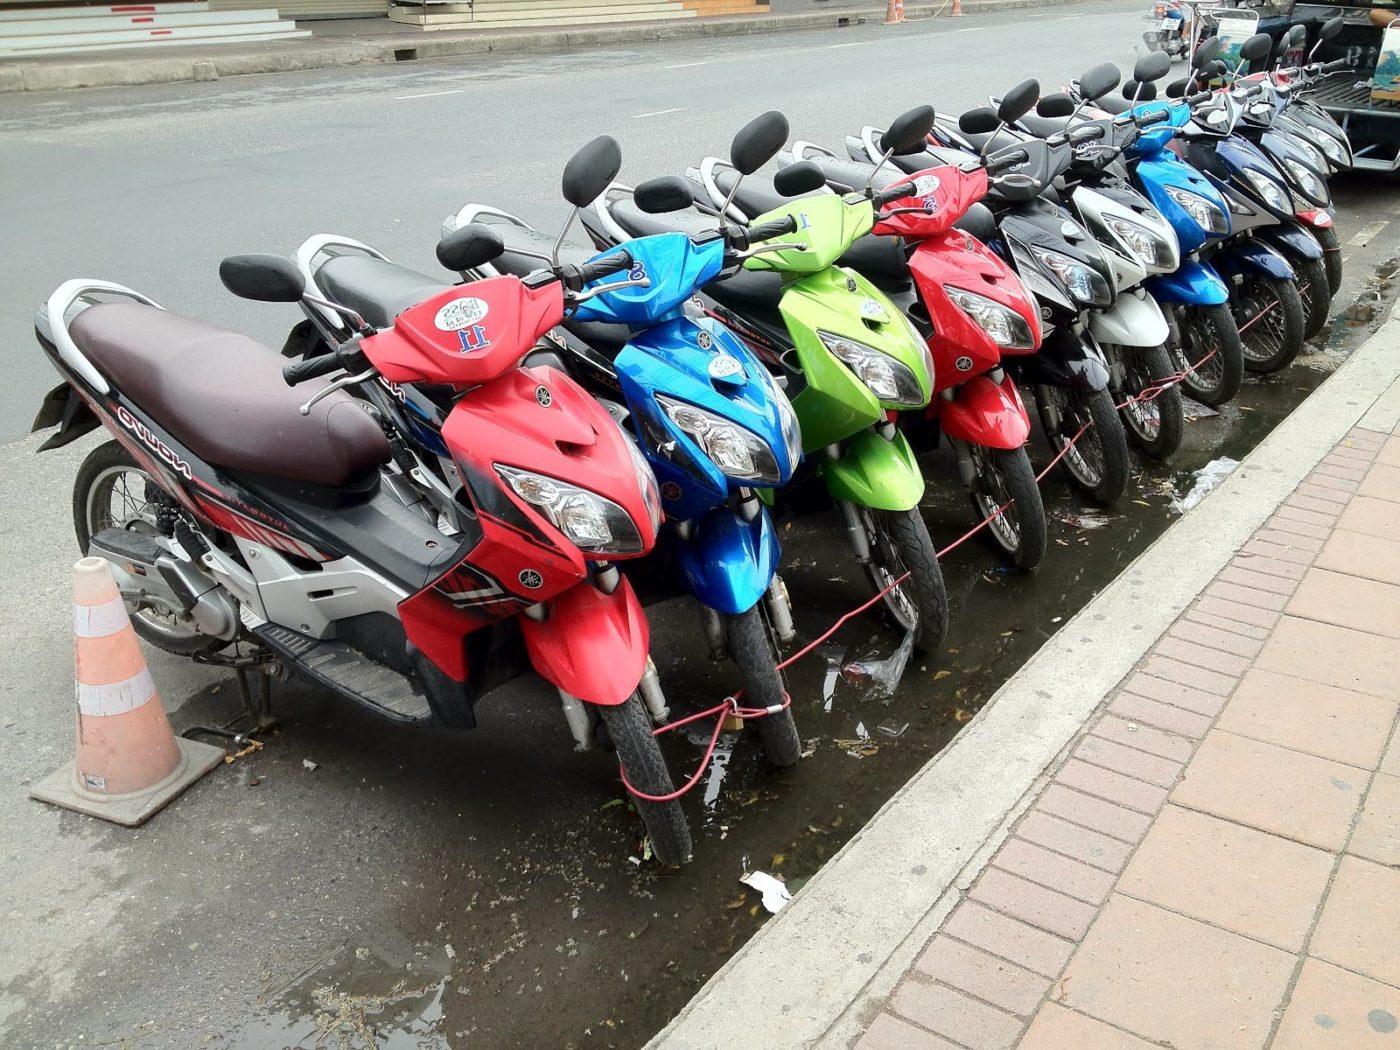 a motorbike rental service in Yogyakarta.Here is a list of motorbike rental service providers in Yogyakarta